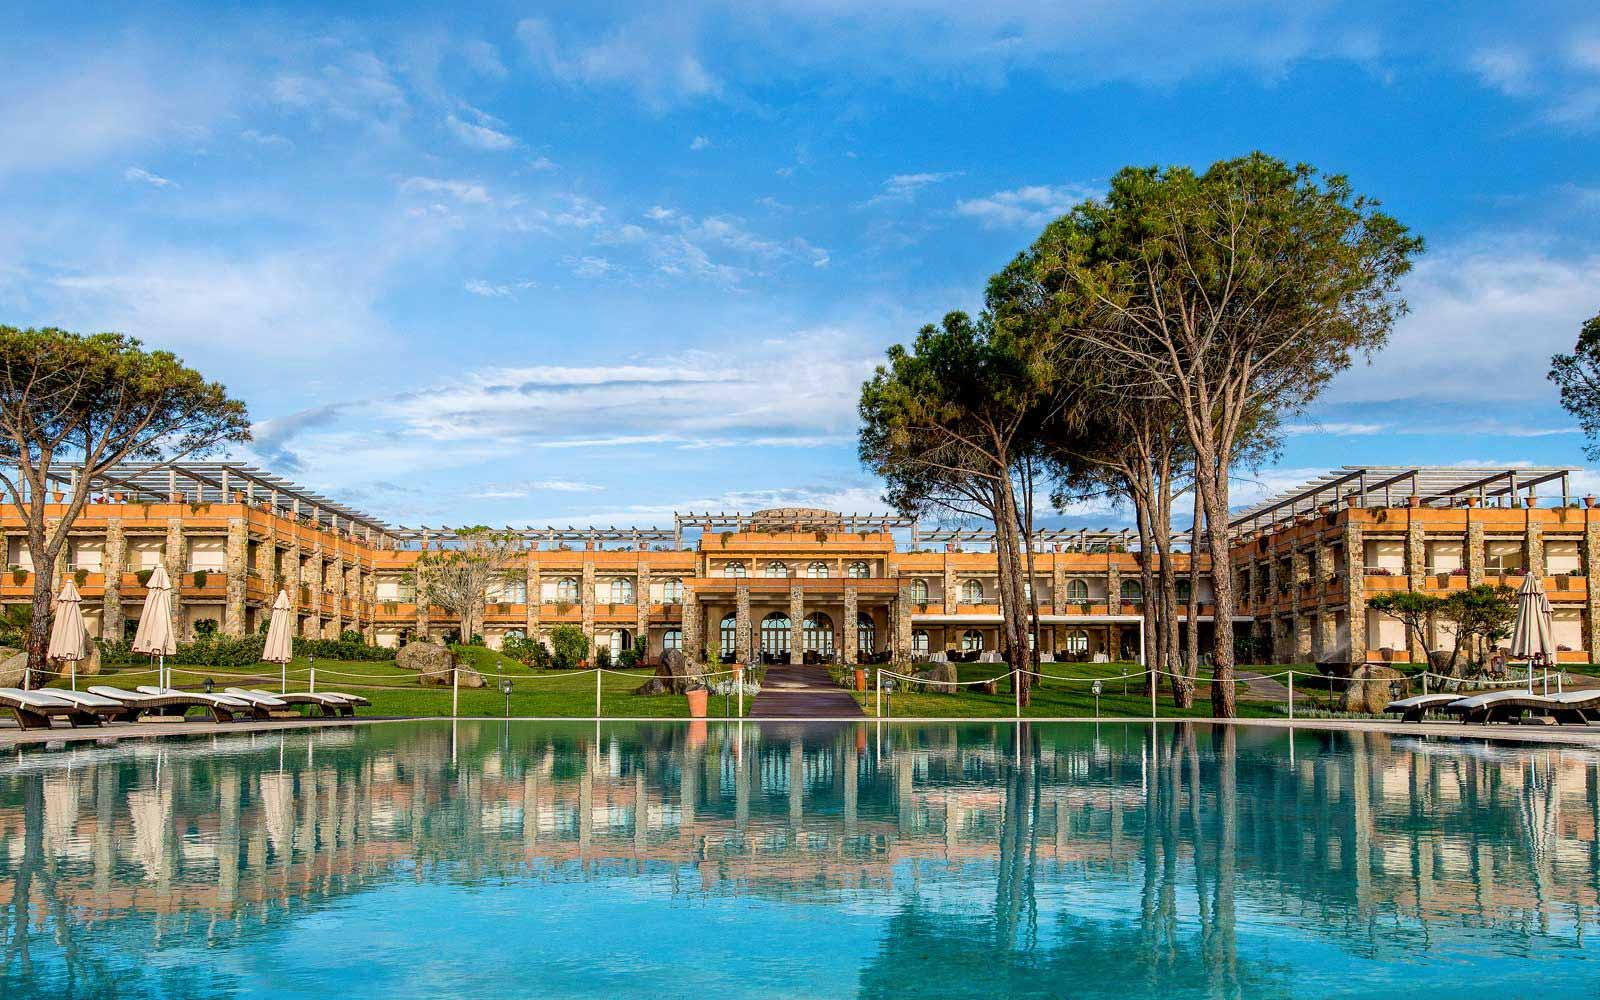 External view of the Hotel Villa del Re